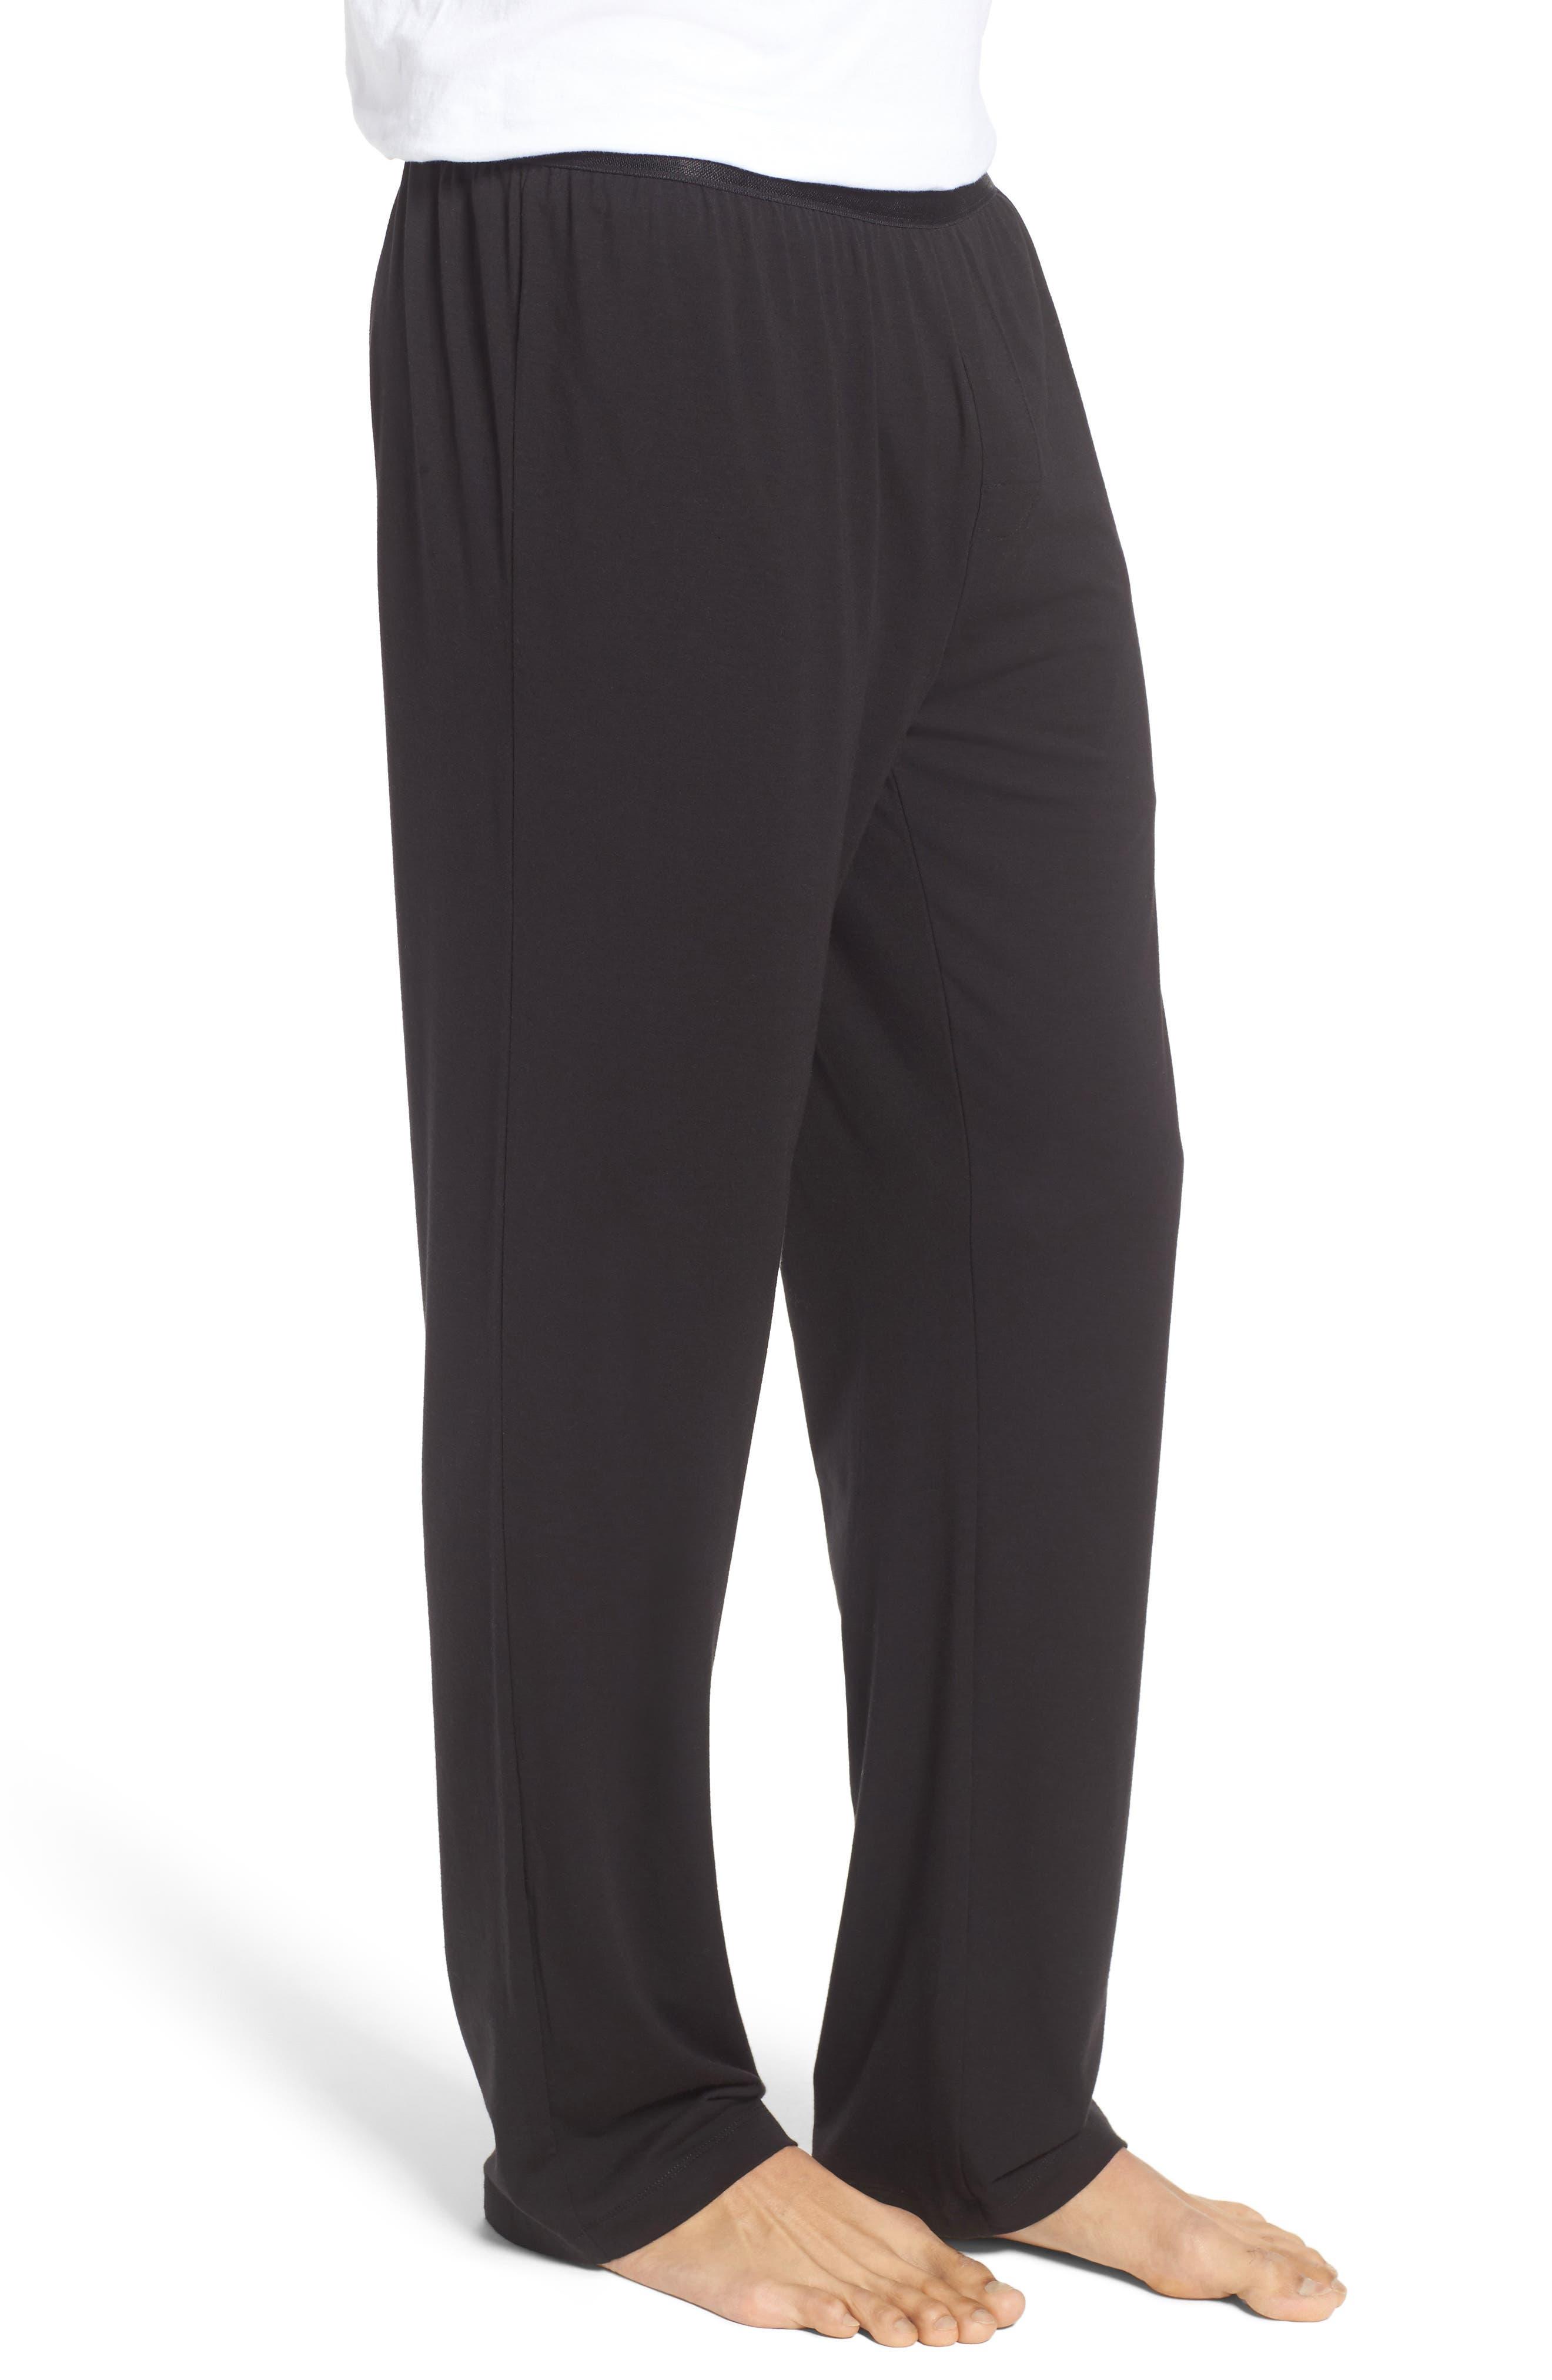 Micromodal Blend Lounge Pants,                             Alternate thumbnail 3, color,                             Black